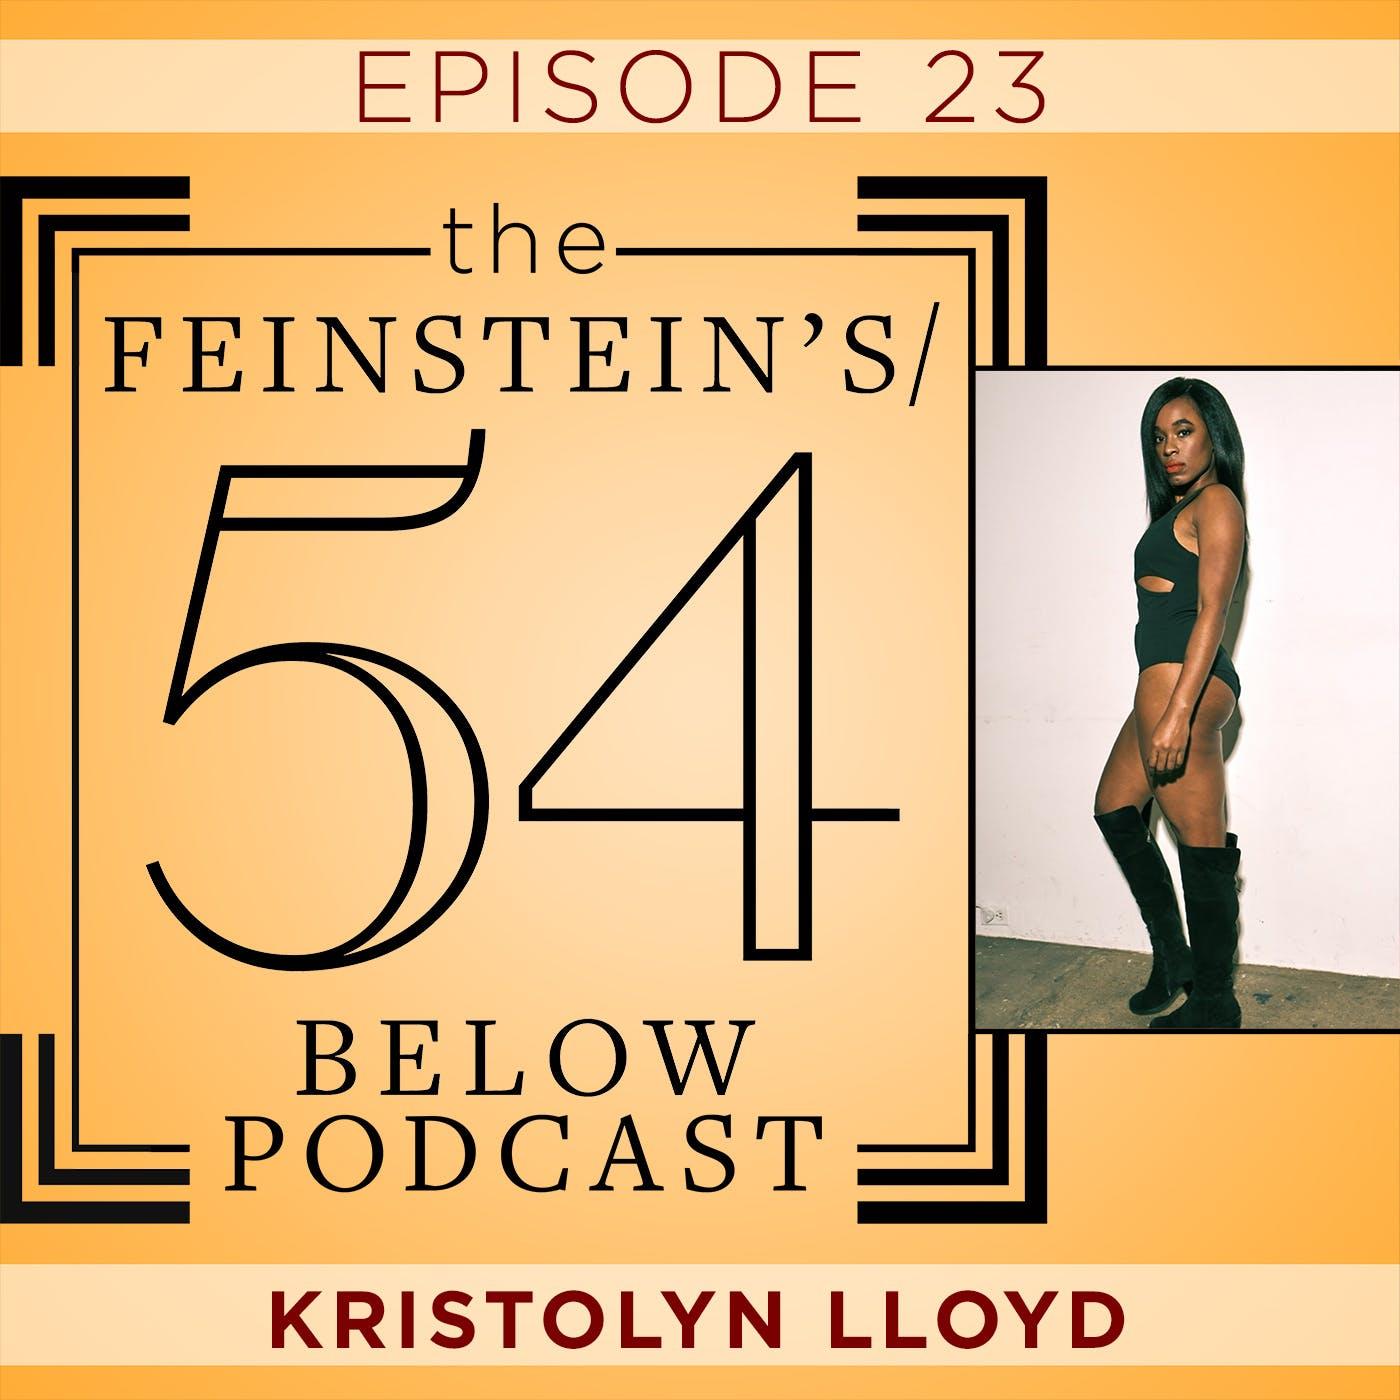 Episode 23: KRISTOLYN LLOYD